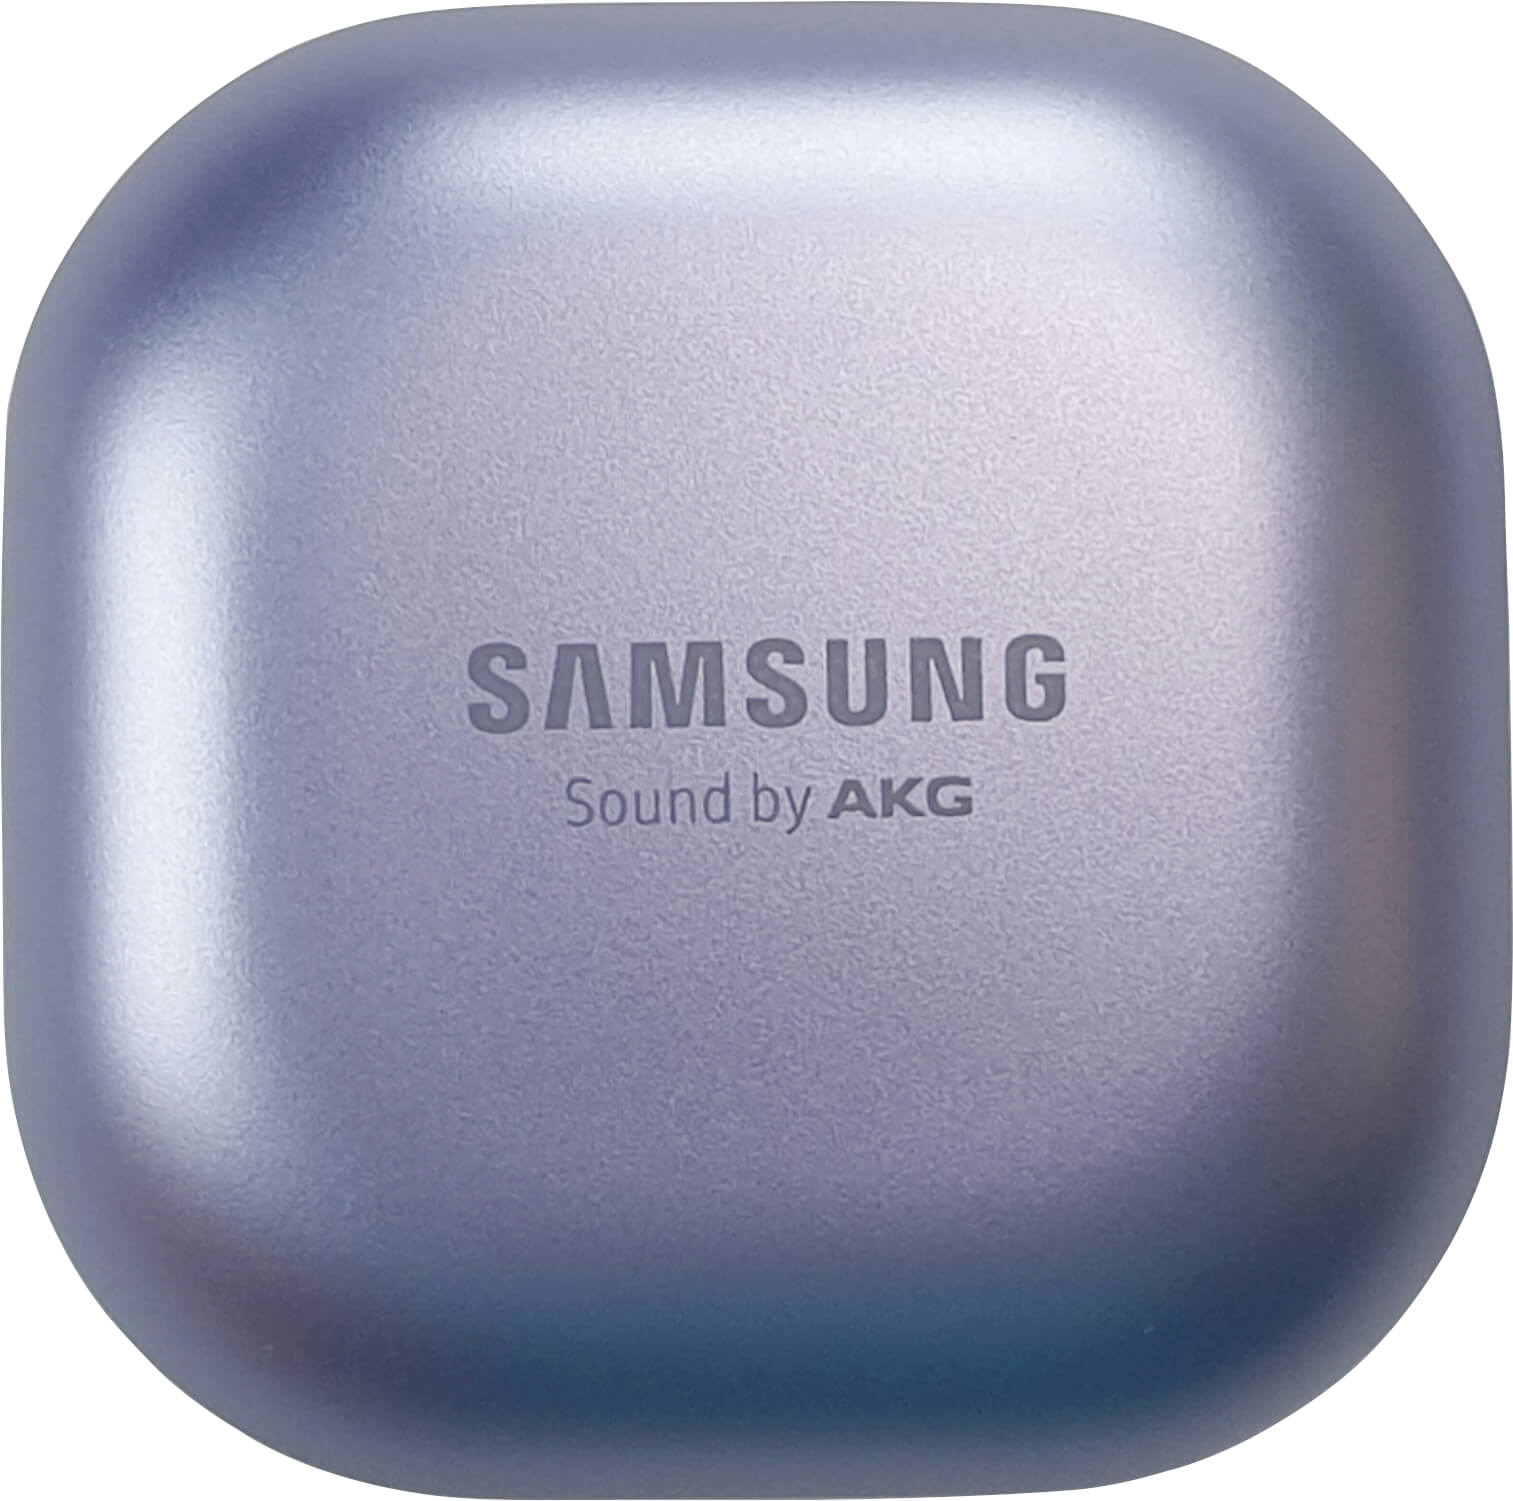 Review Samsung Galaxy Buds Pro: ¡Bien hecho Samsung!